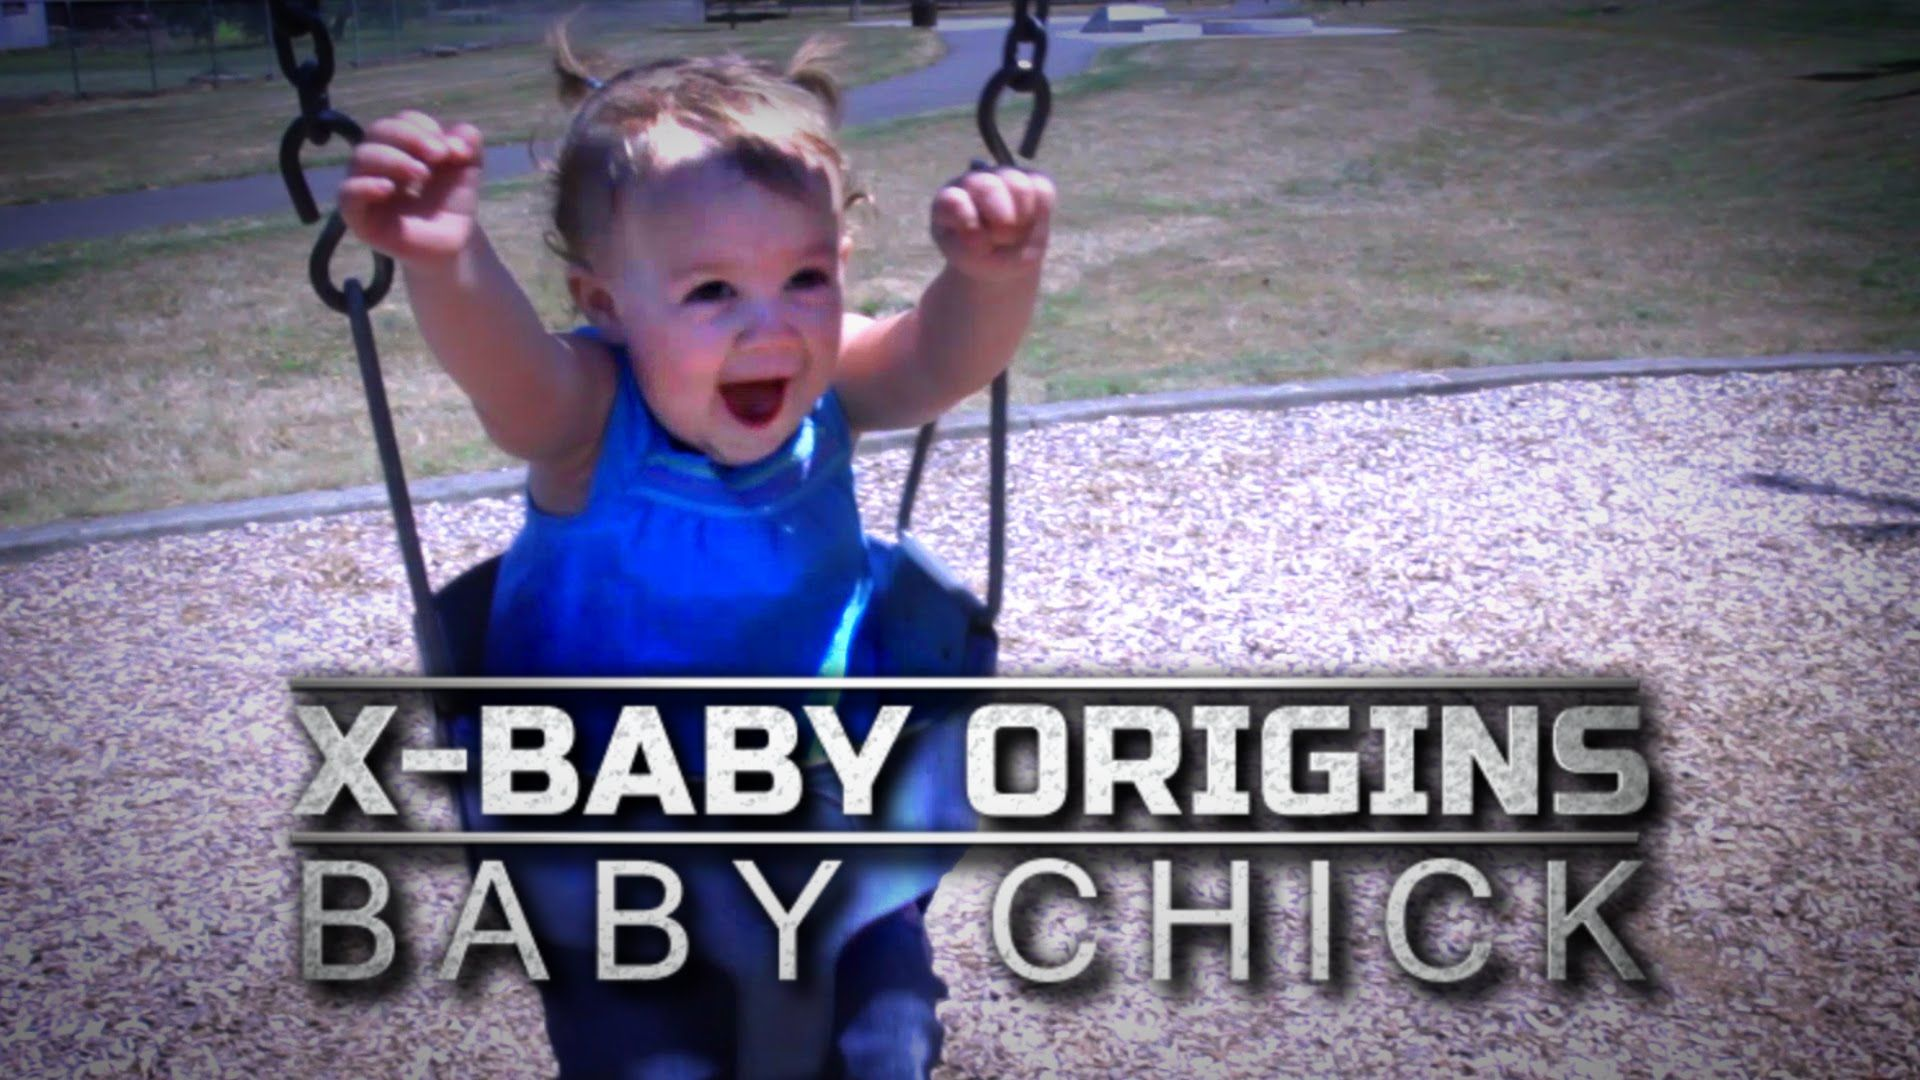 Baby Chick heads to the park and discovers her X-traordinary mutant super powers! http://youtu.be/z1rNjJ8YZRU?list=PL8M6Q4vT_l6gz32_Znz4gfePbdkuWXxjp